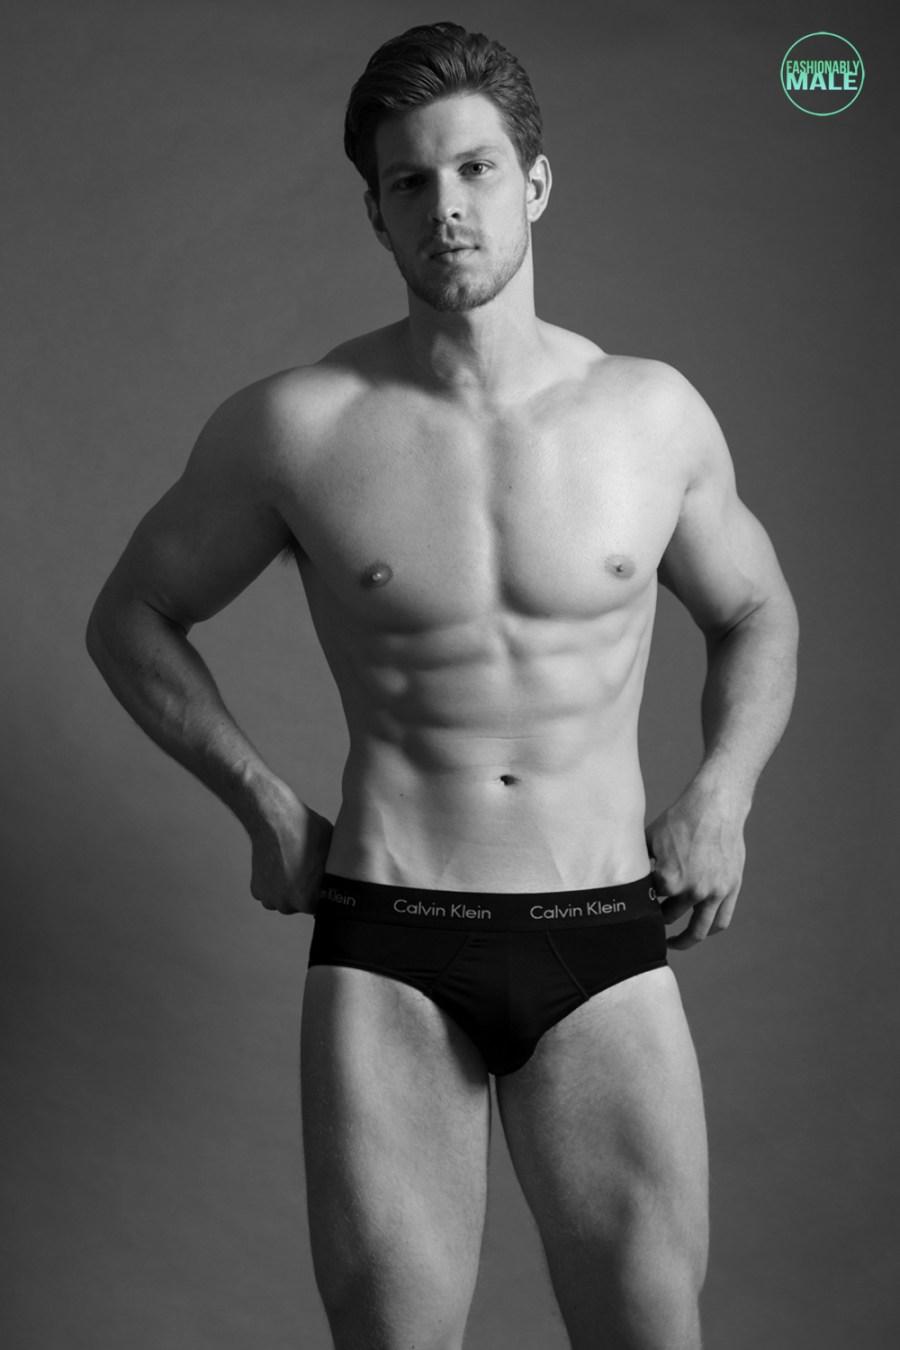 Matthew Mason for Fashionably Male (13)